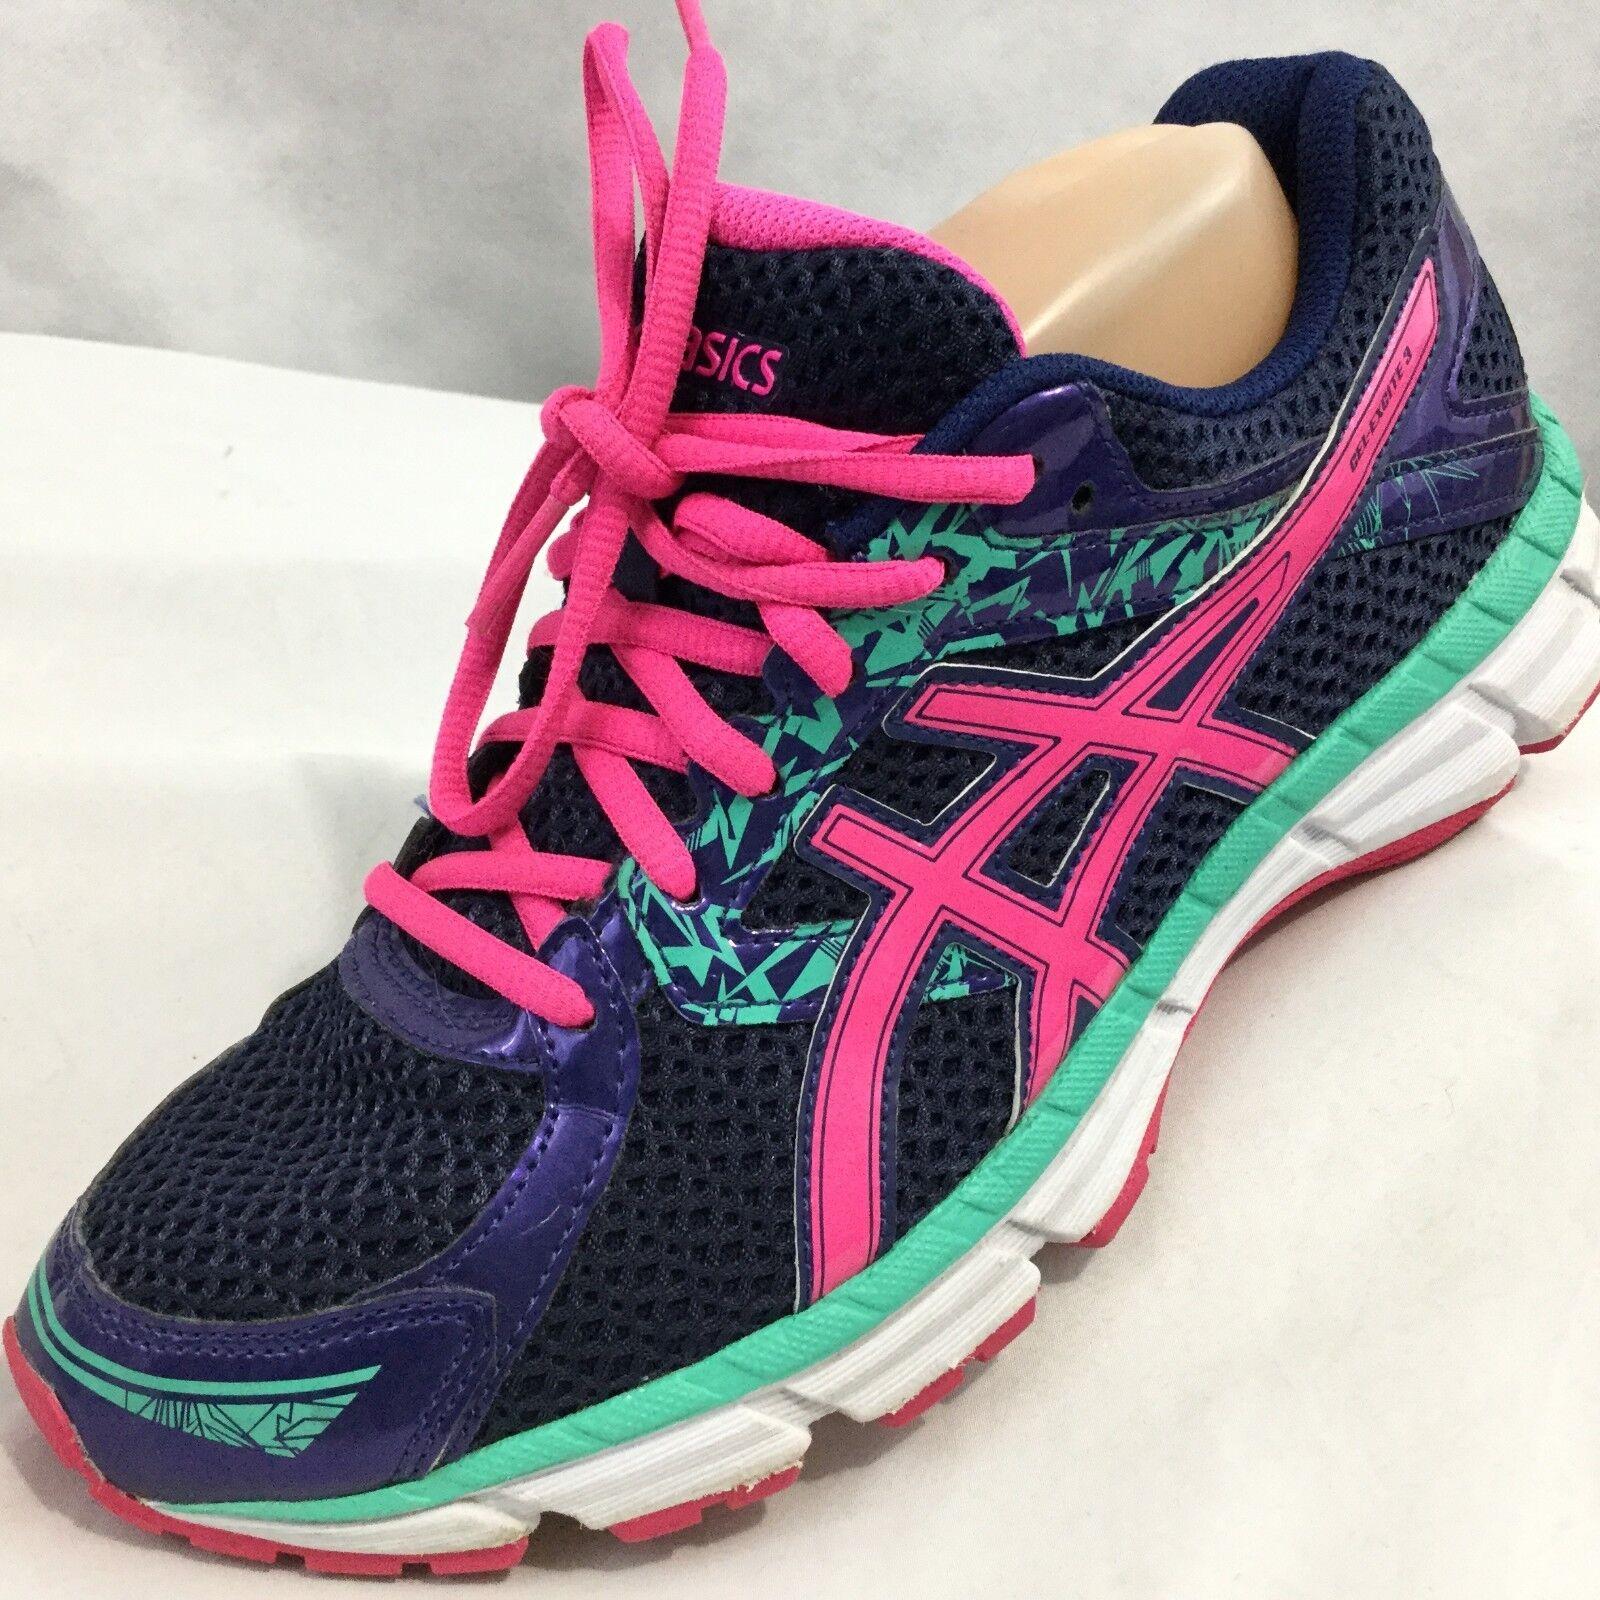 Asics Gel Excite 3 Running shoes Purple Aqua Pink Sz 7.5 Euro 39 Light Workout